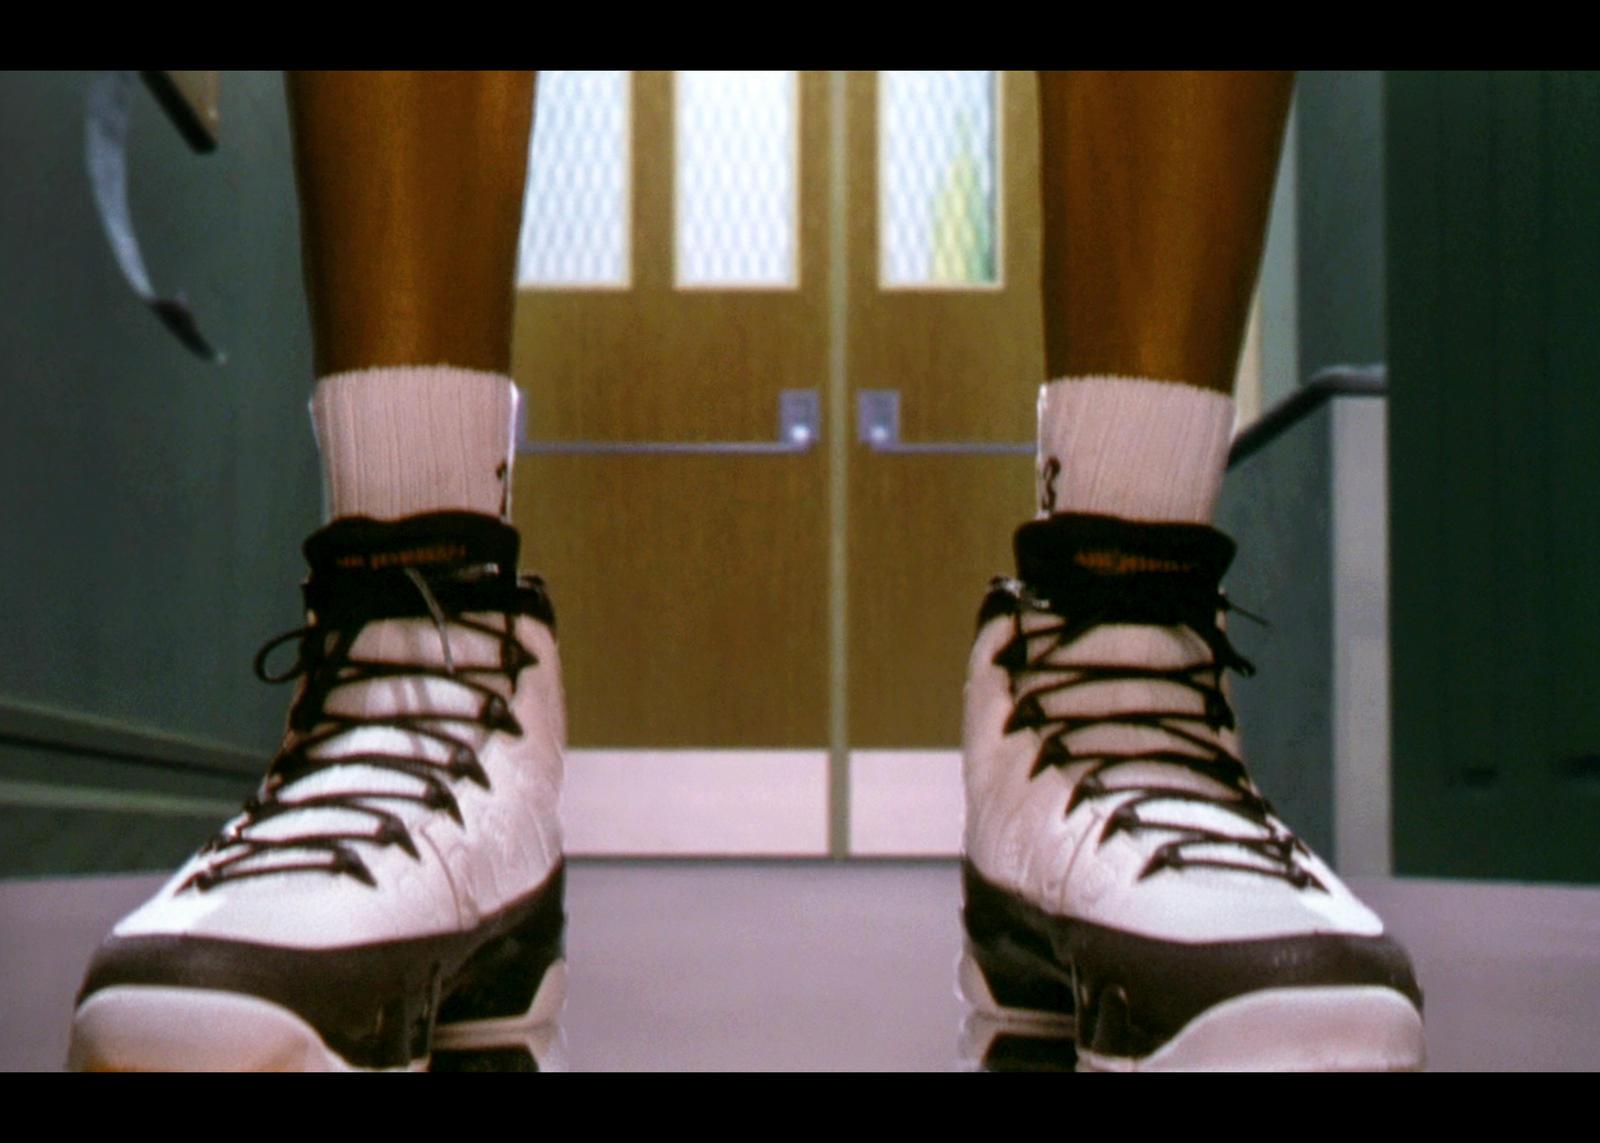 670d29a69898 Jordan Brand Unveils Space Jam Collection - Nike News